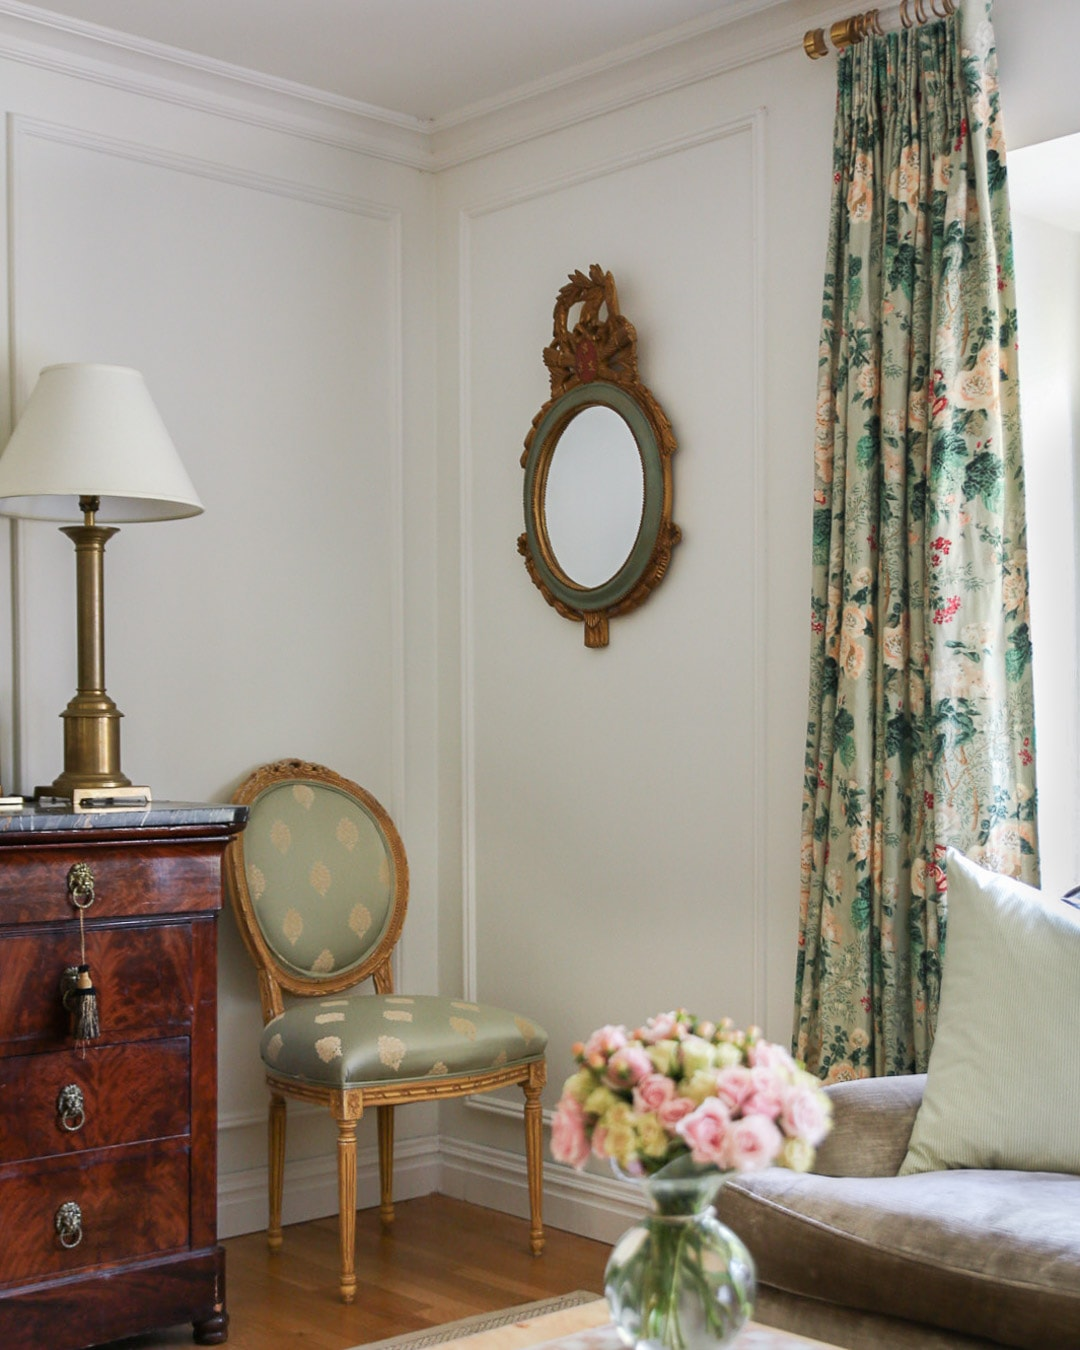 louis-xvi-dining-room-chair